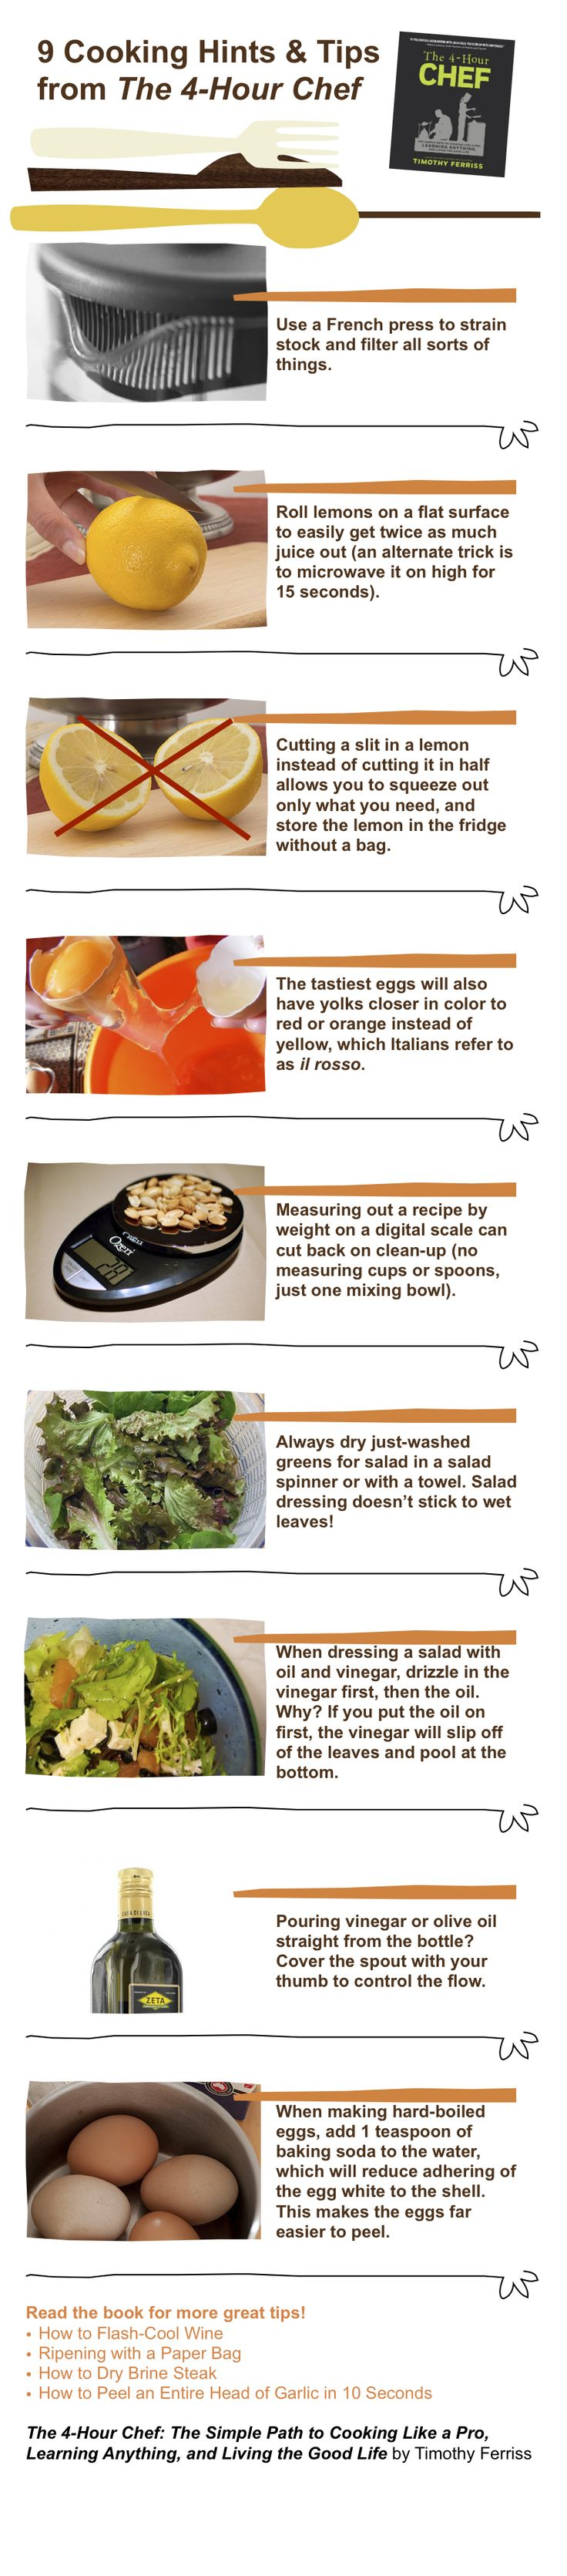 30 best Tim Ferris 4 Hour Chef images on Pinterest | Tim ferriss ...